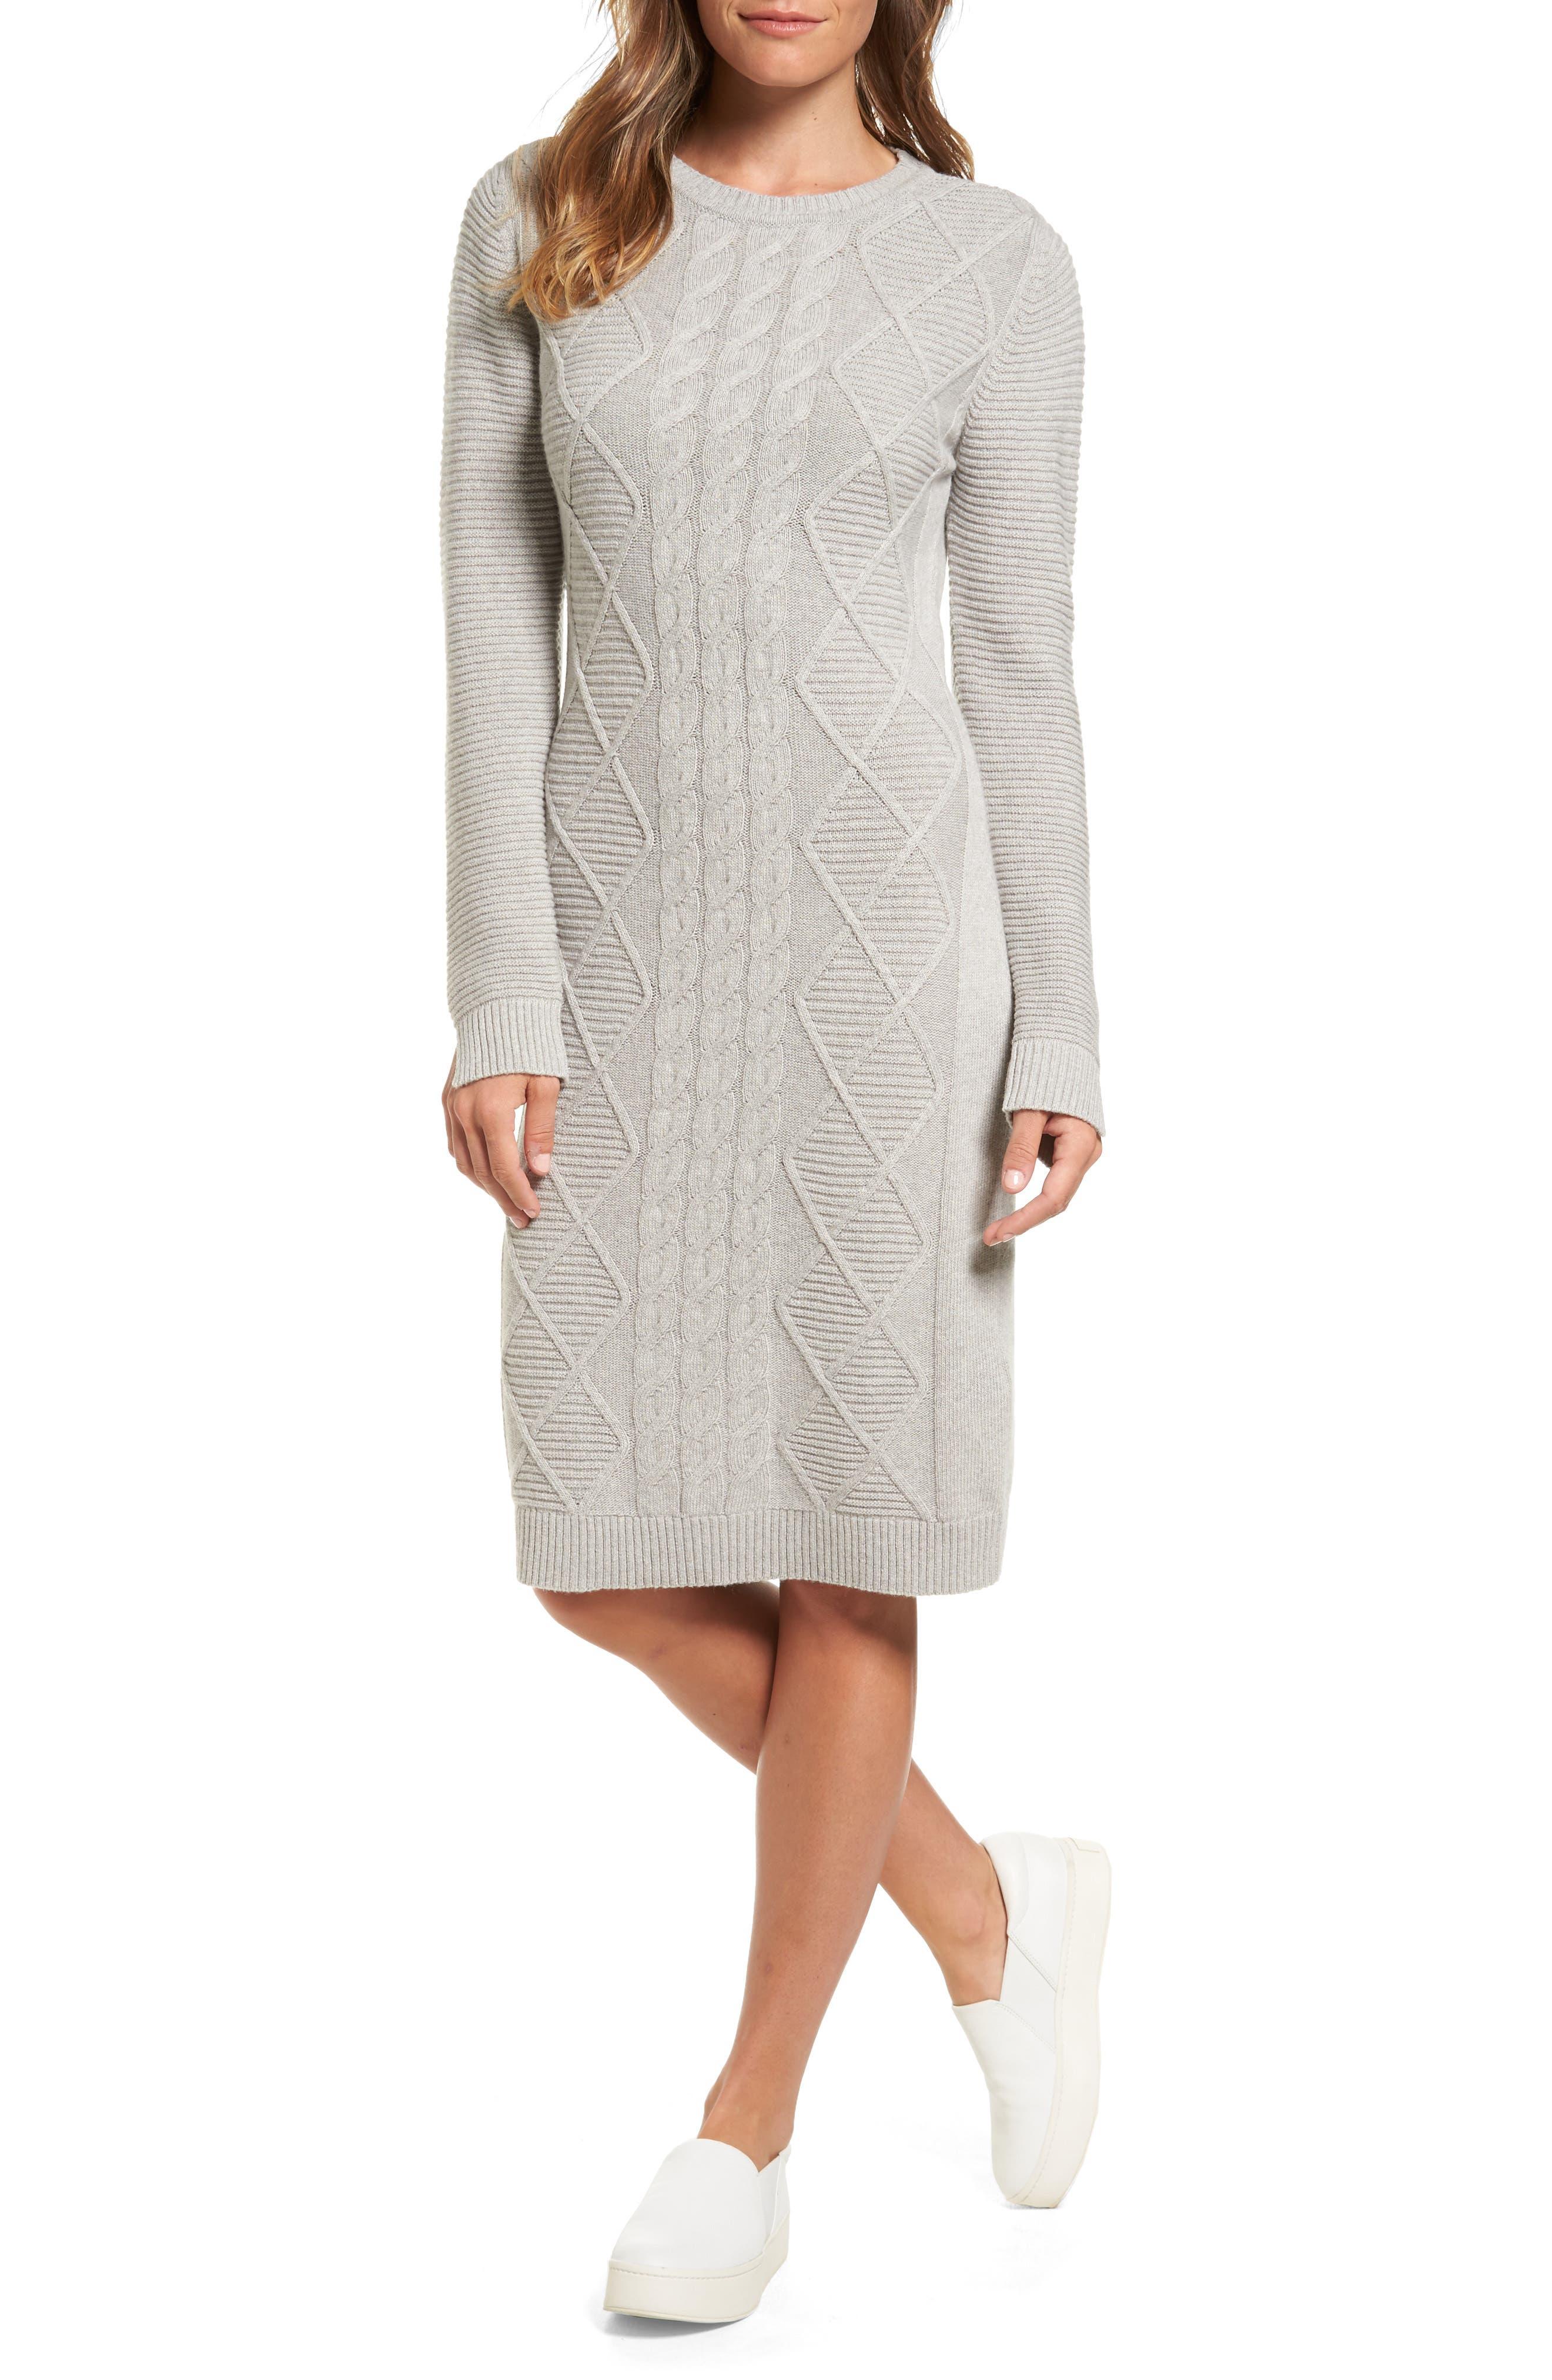 Emmanuel Cable Knit Sweater Dress,                         Main,                         color, Light Grey Marl